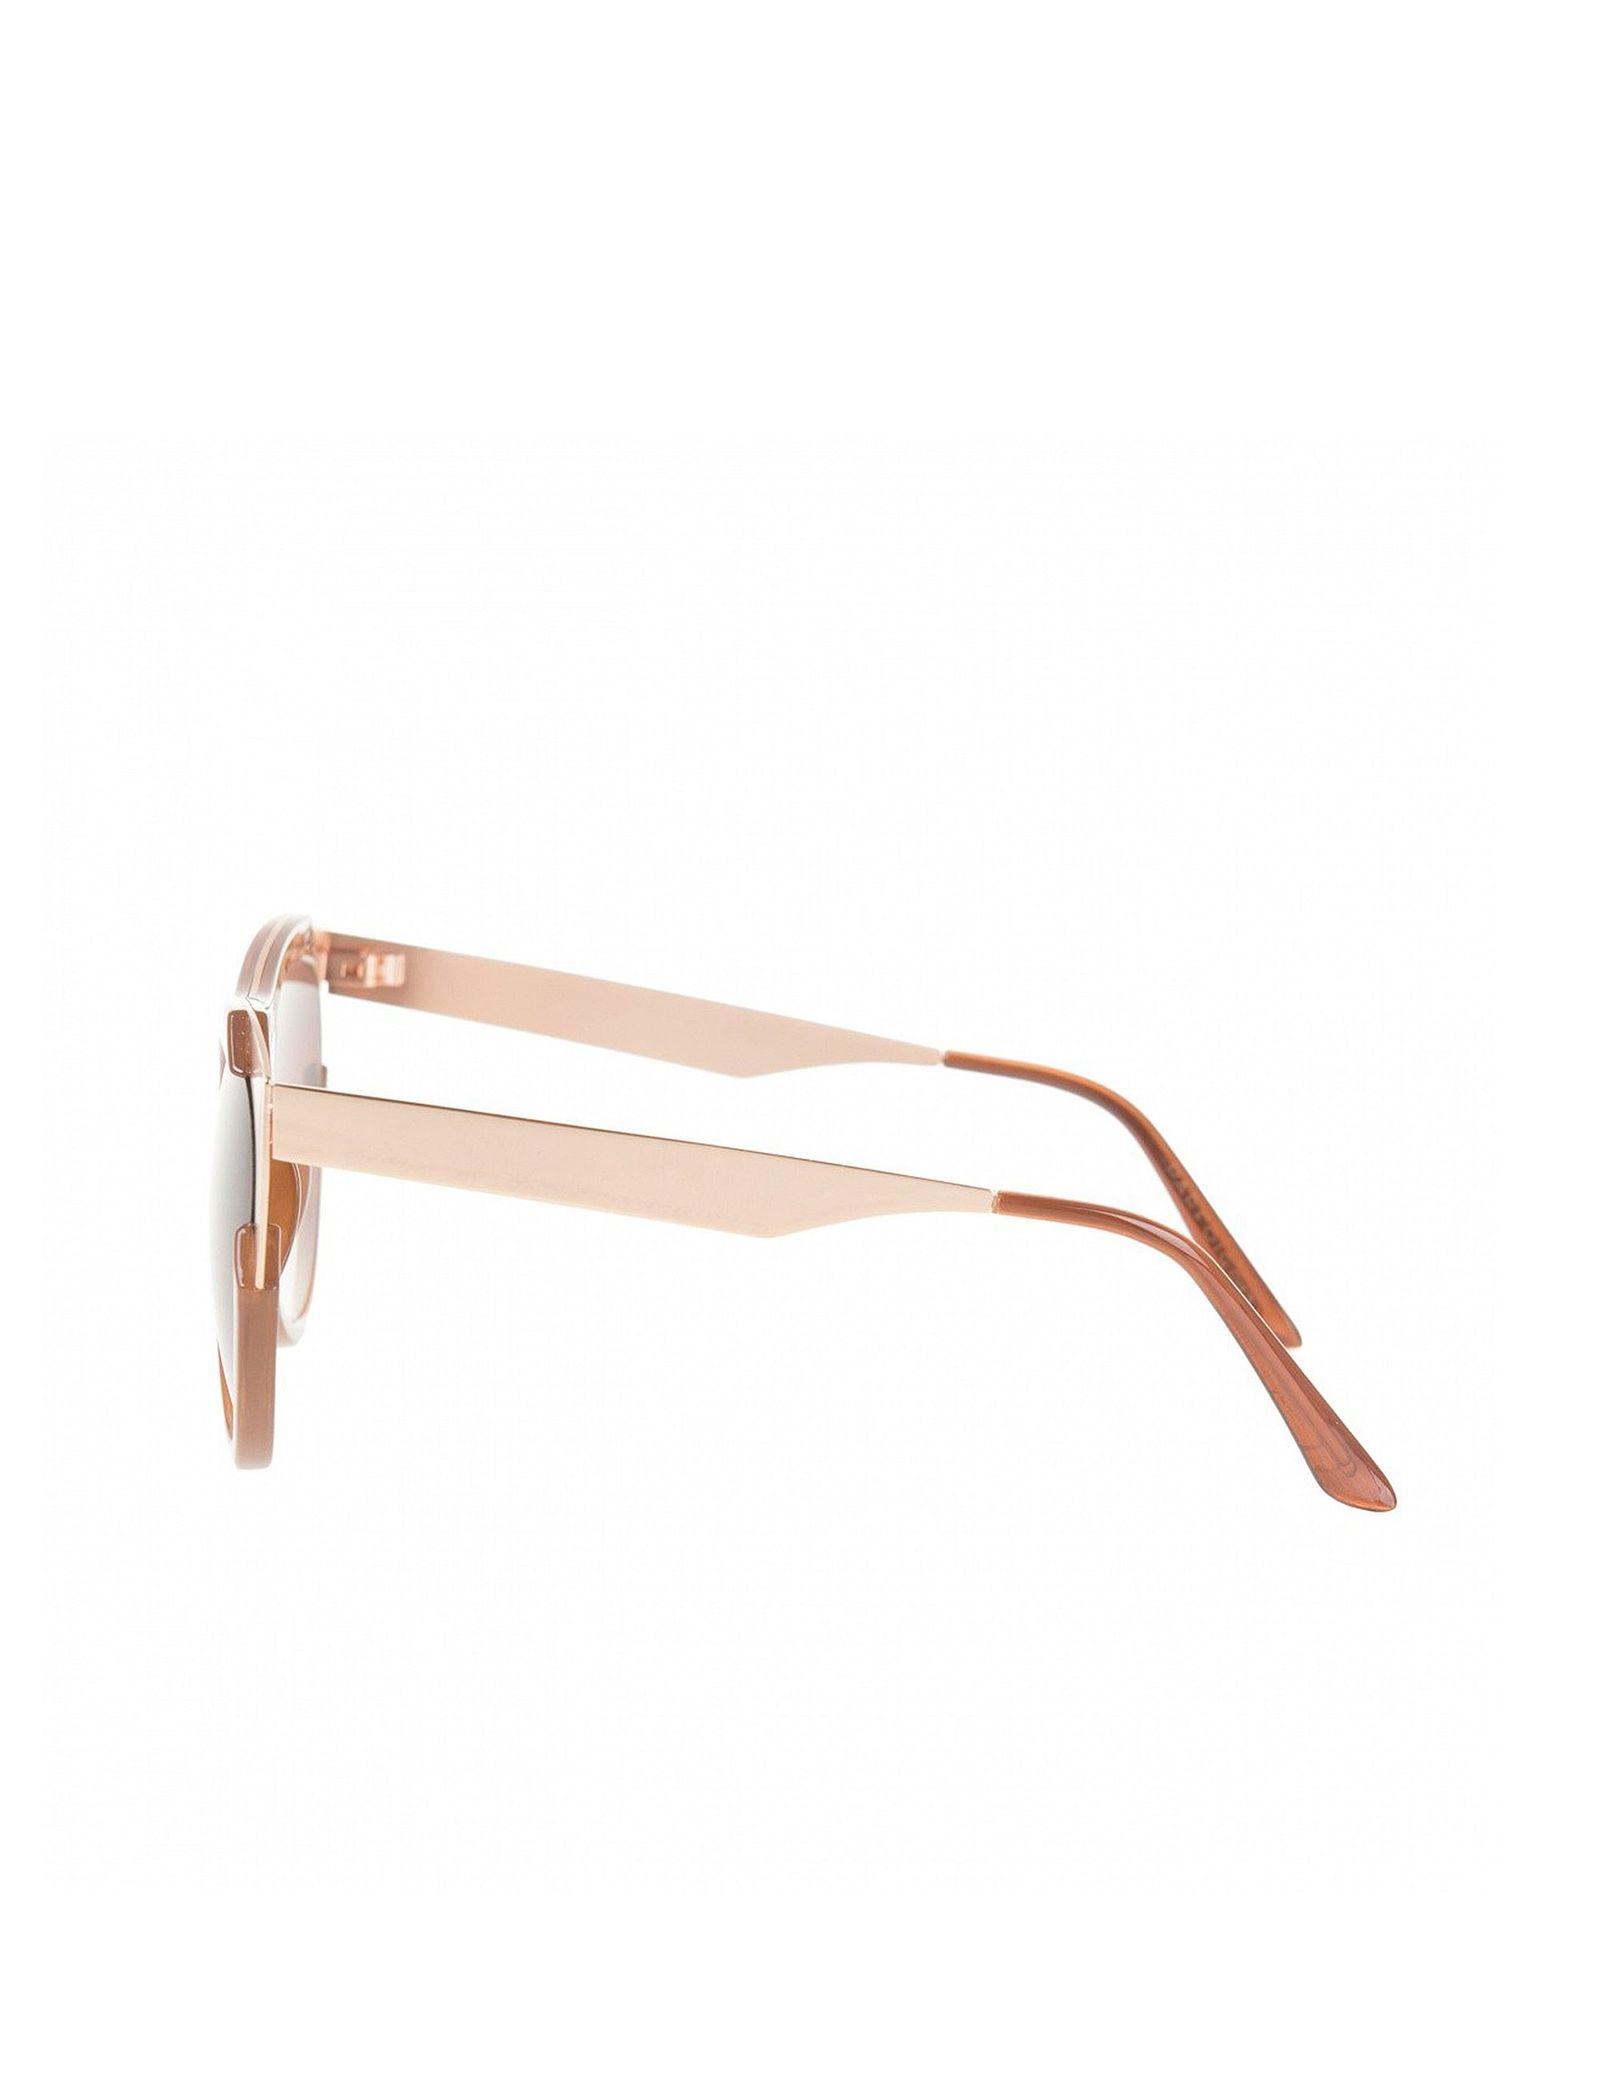 عینک آفتابی زنانه - پارفوا - صورتي - 2